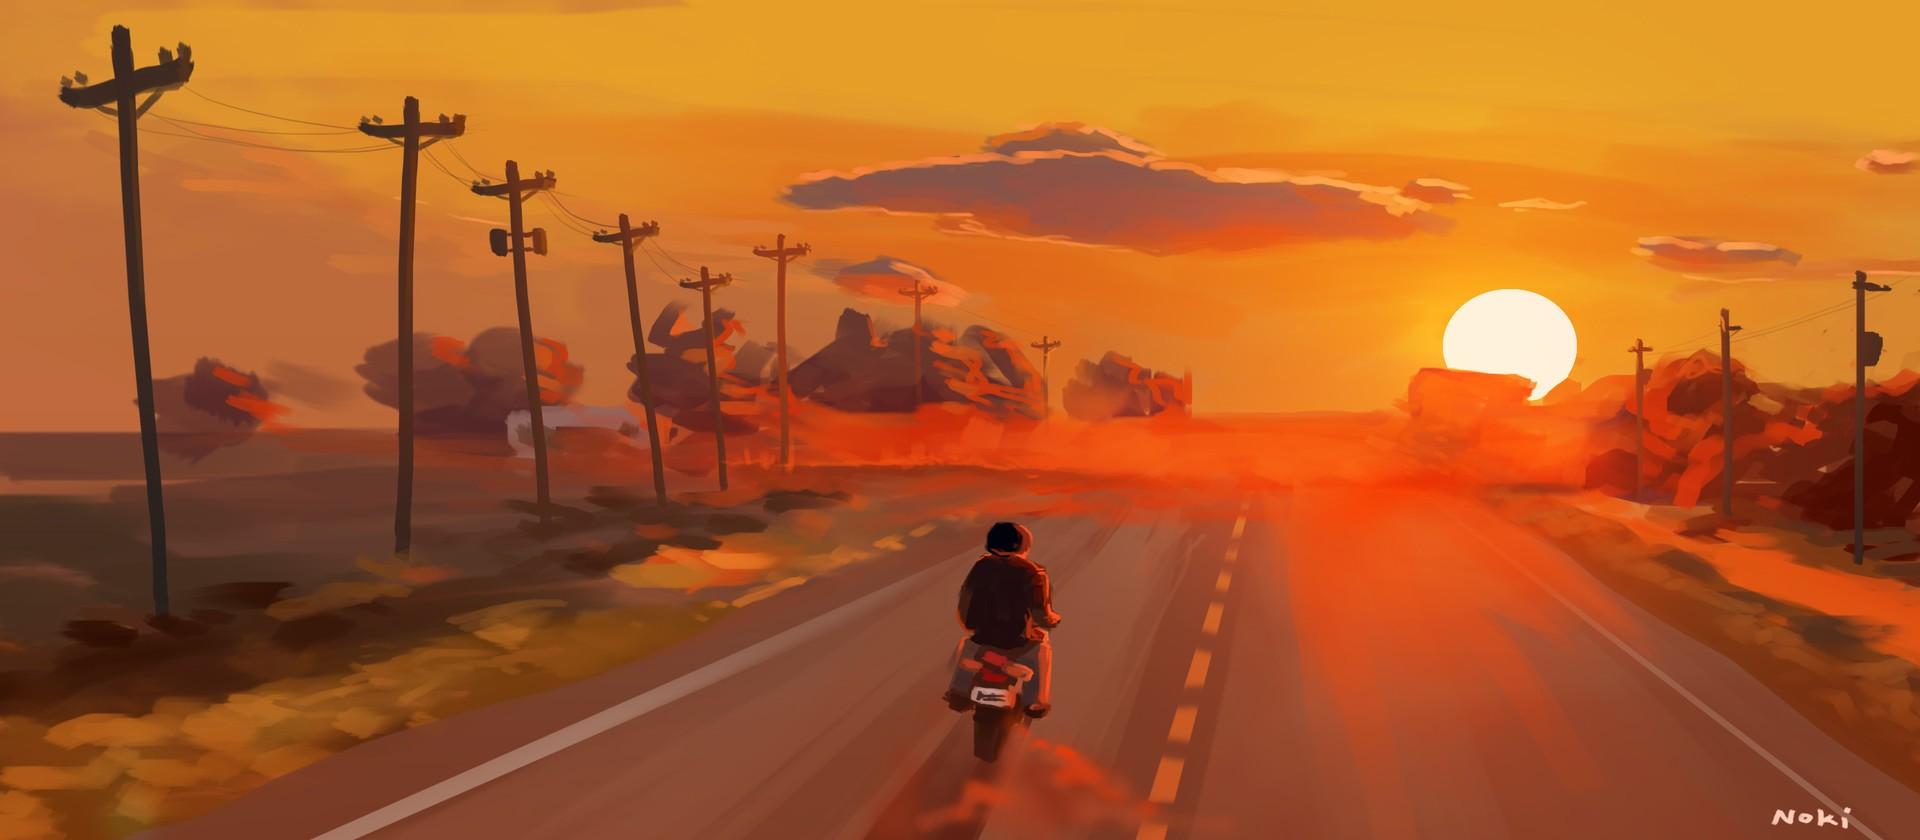 Sunset Road Illustration Wallpapers Hd Desktop And Mobile Backgrounds